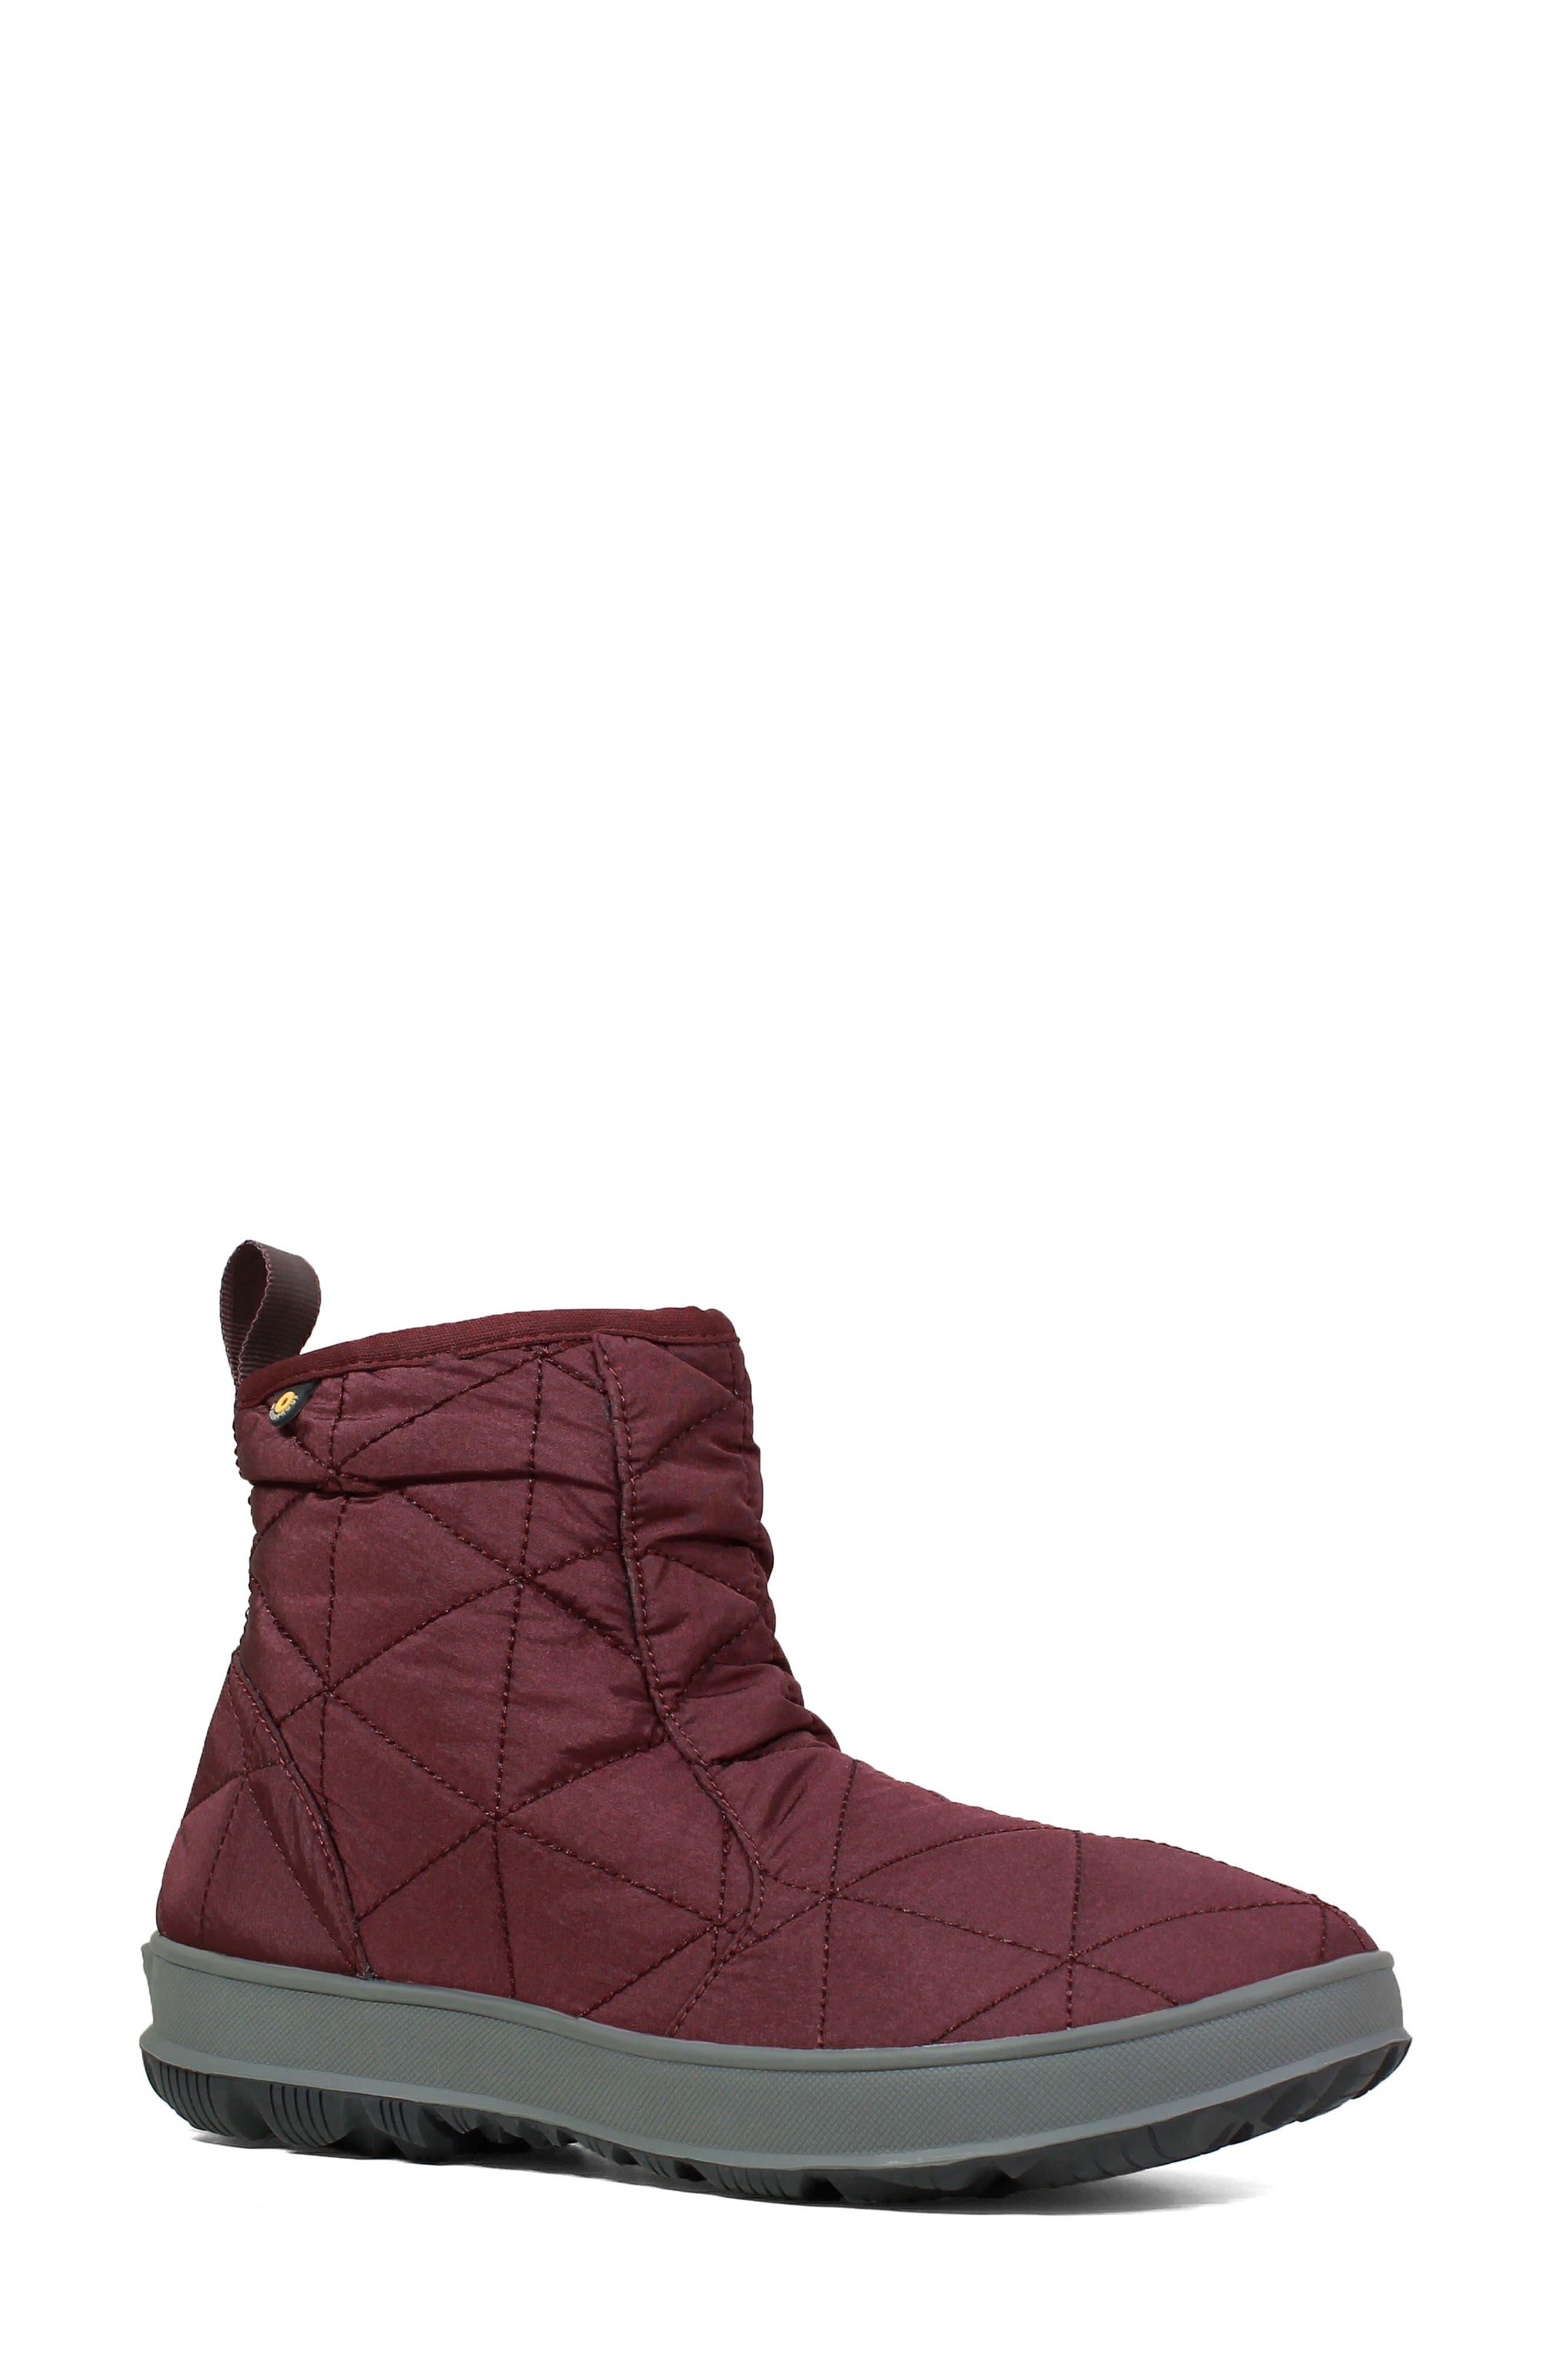 Bogs Snowday Waterproof Quilted Snow Boot, Burgundy